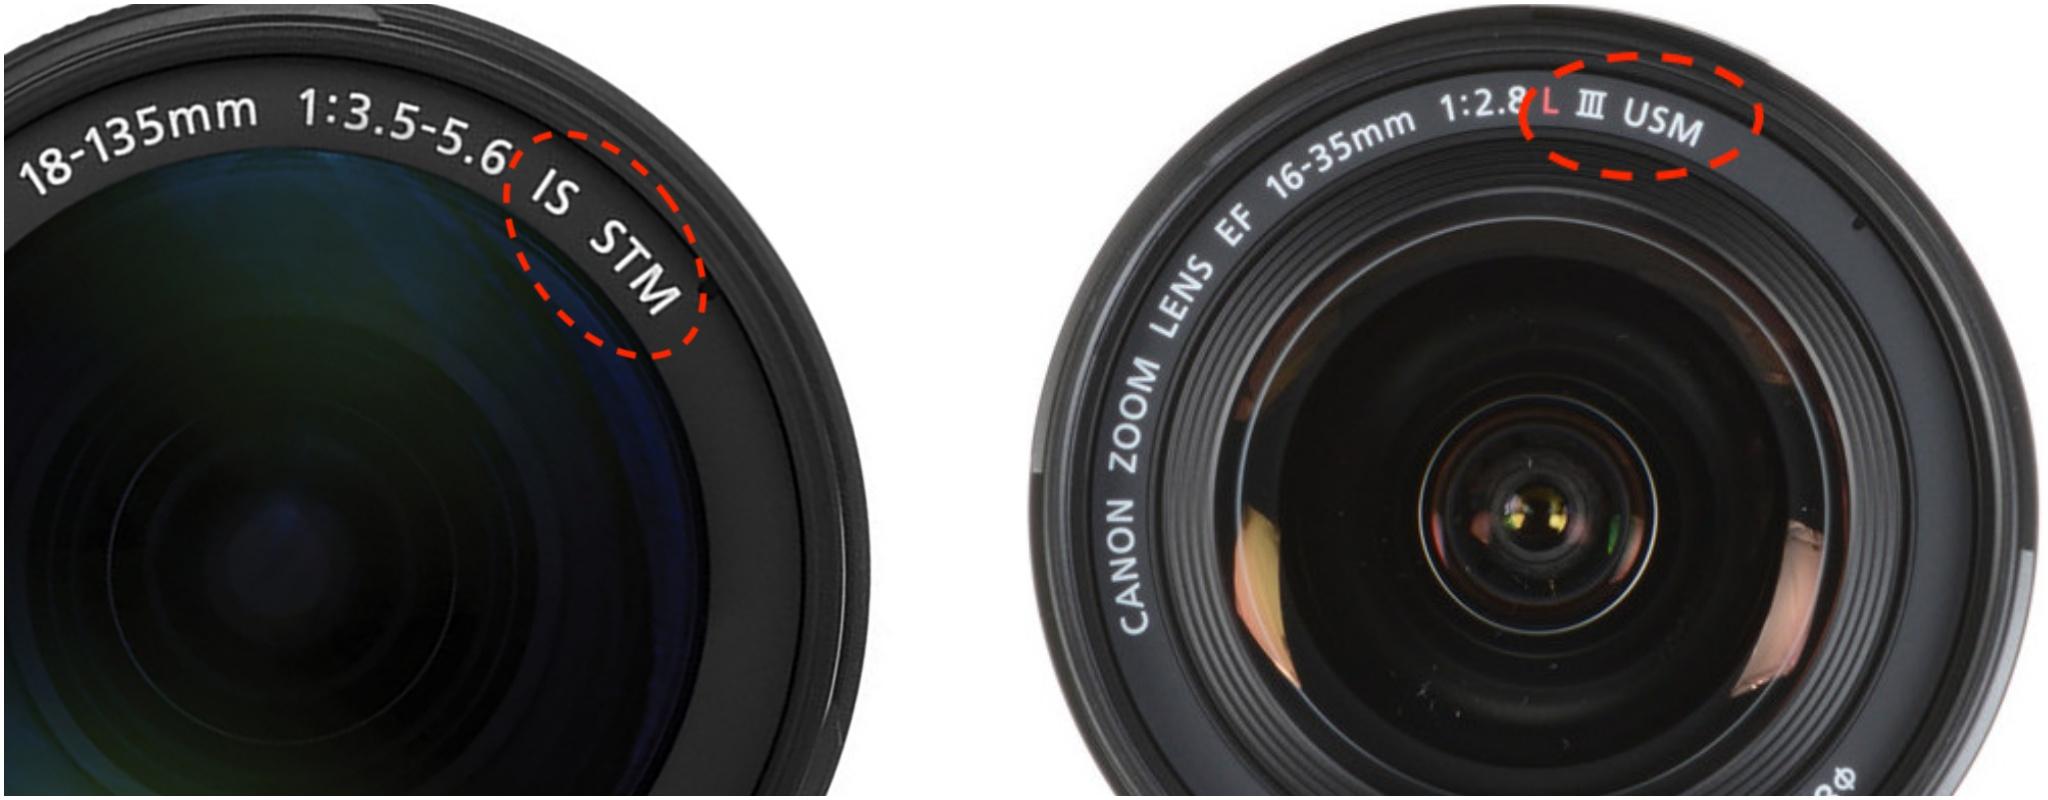 Canon lens symbol - Camera.tinhte.vn .jpg